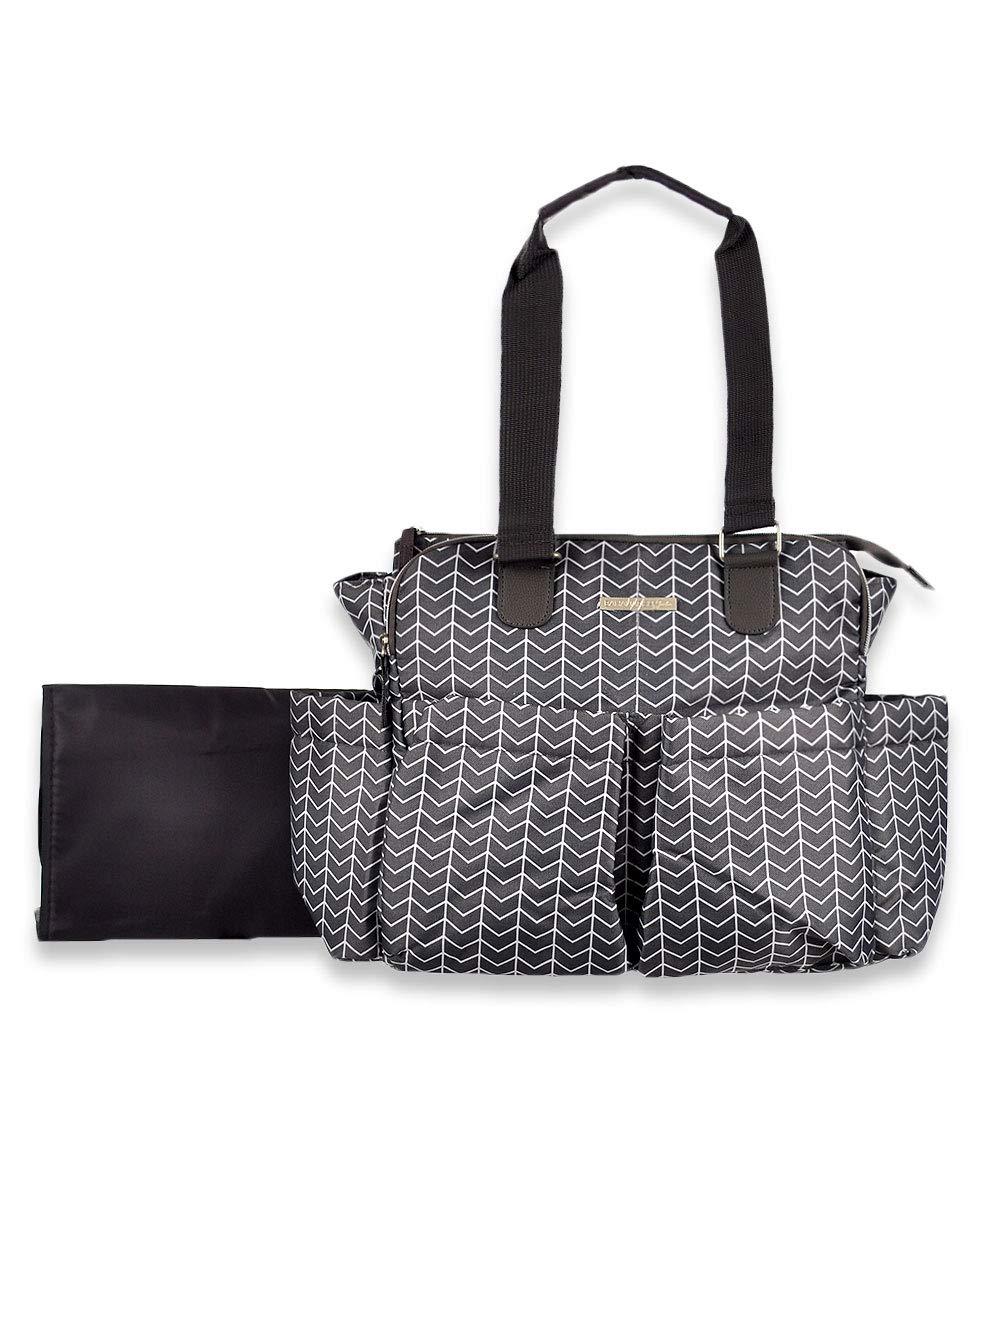 Bananafish Studio Sienna Diaper Bag - Multi, one Size